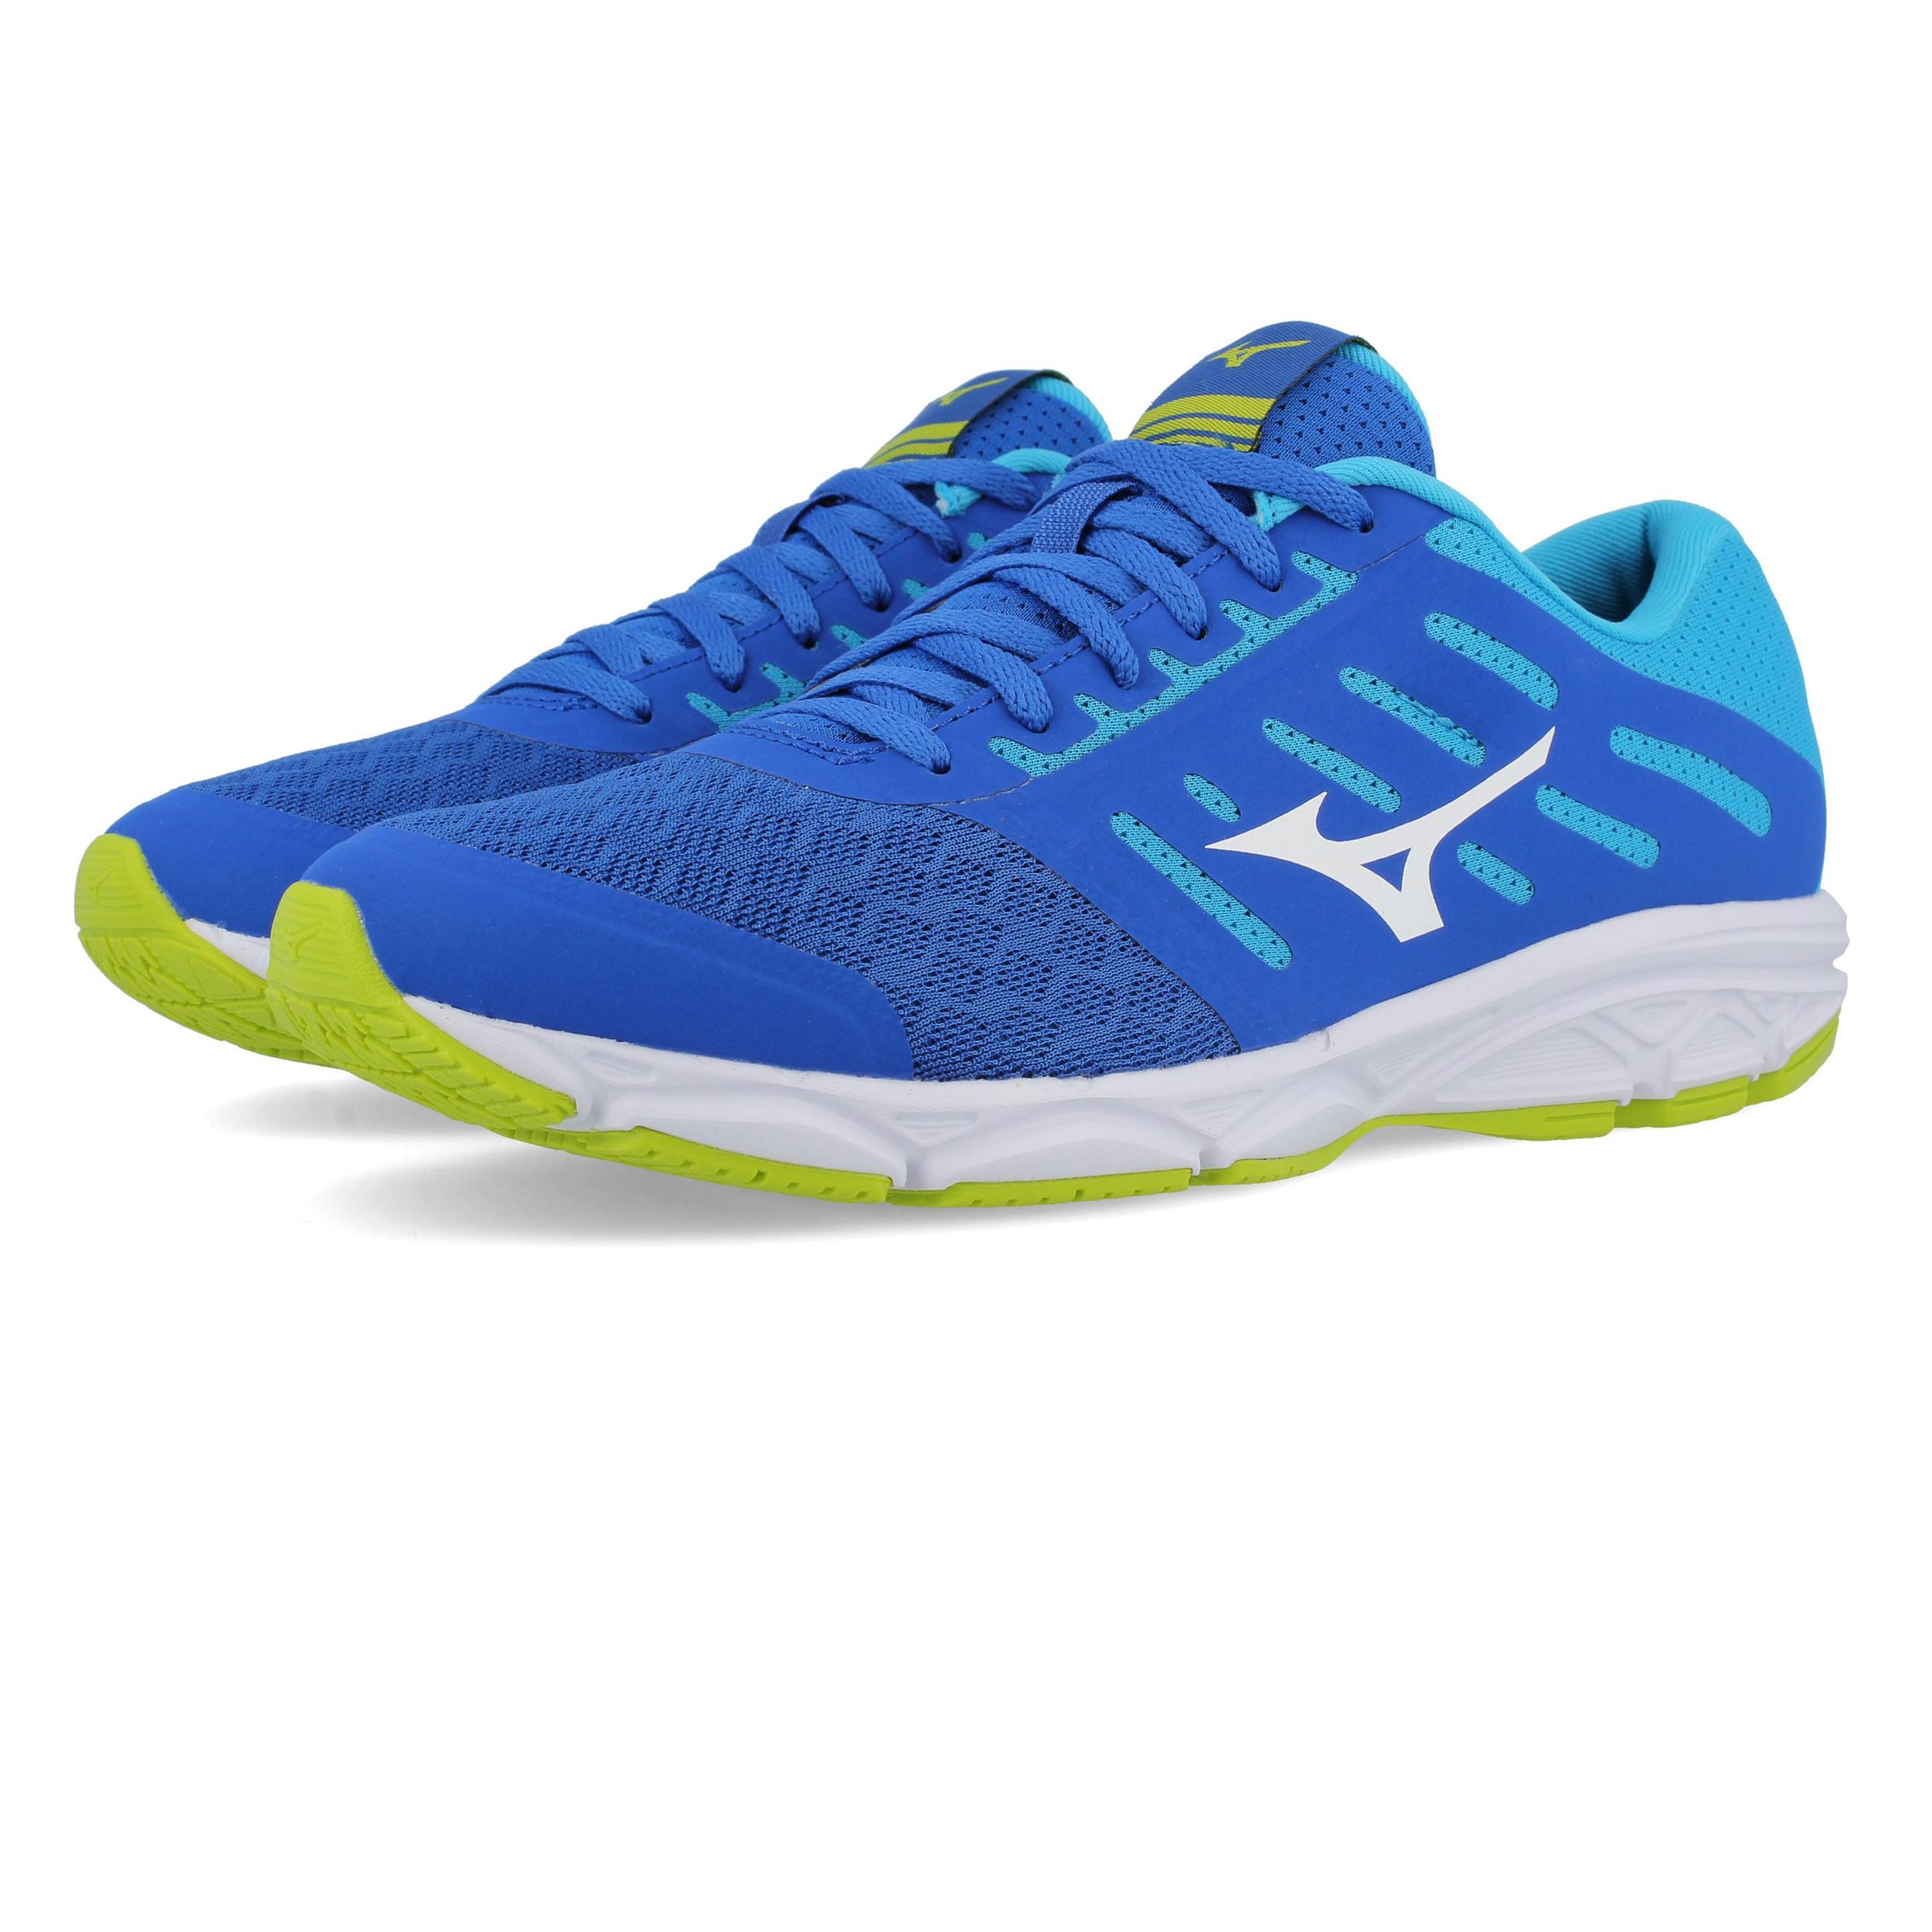 8e41bb8658 ... buy mizuno herren ezrun jogging sport schuhe turnschuhe laufschuhe  sneaker blau 7e55b 0f460